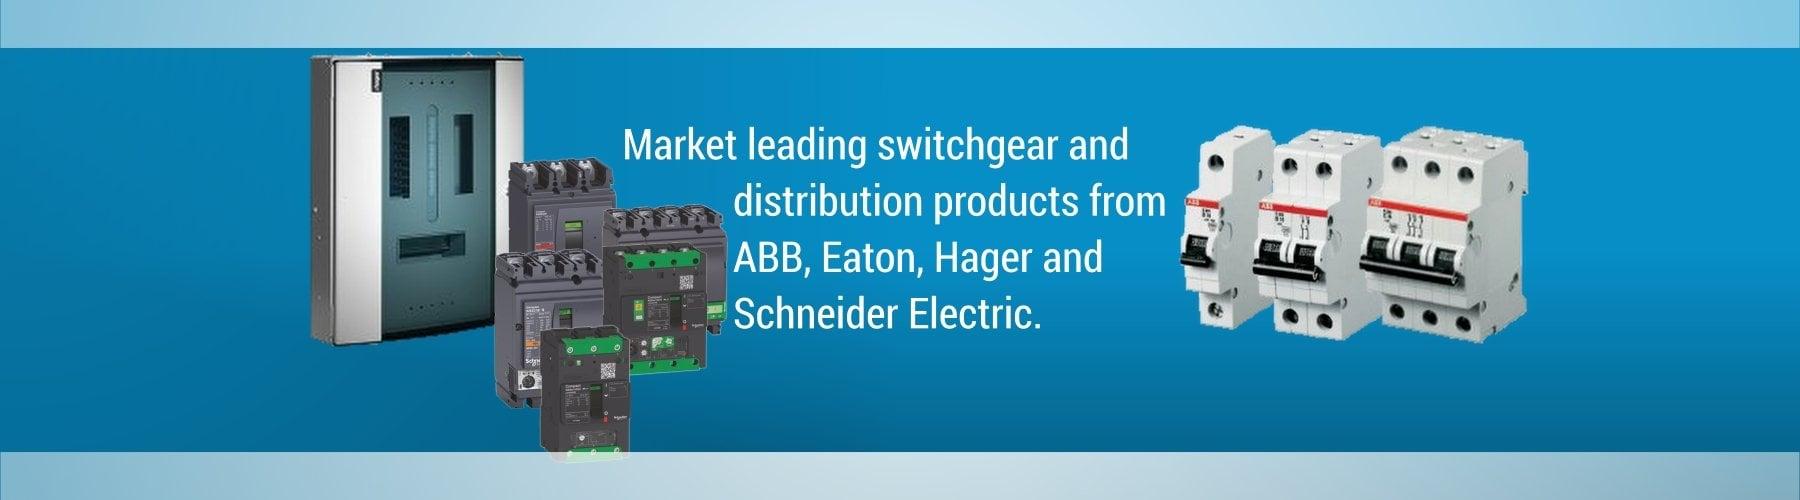 Switchgear & Distribution banner